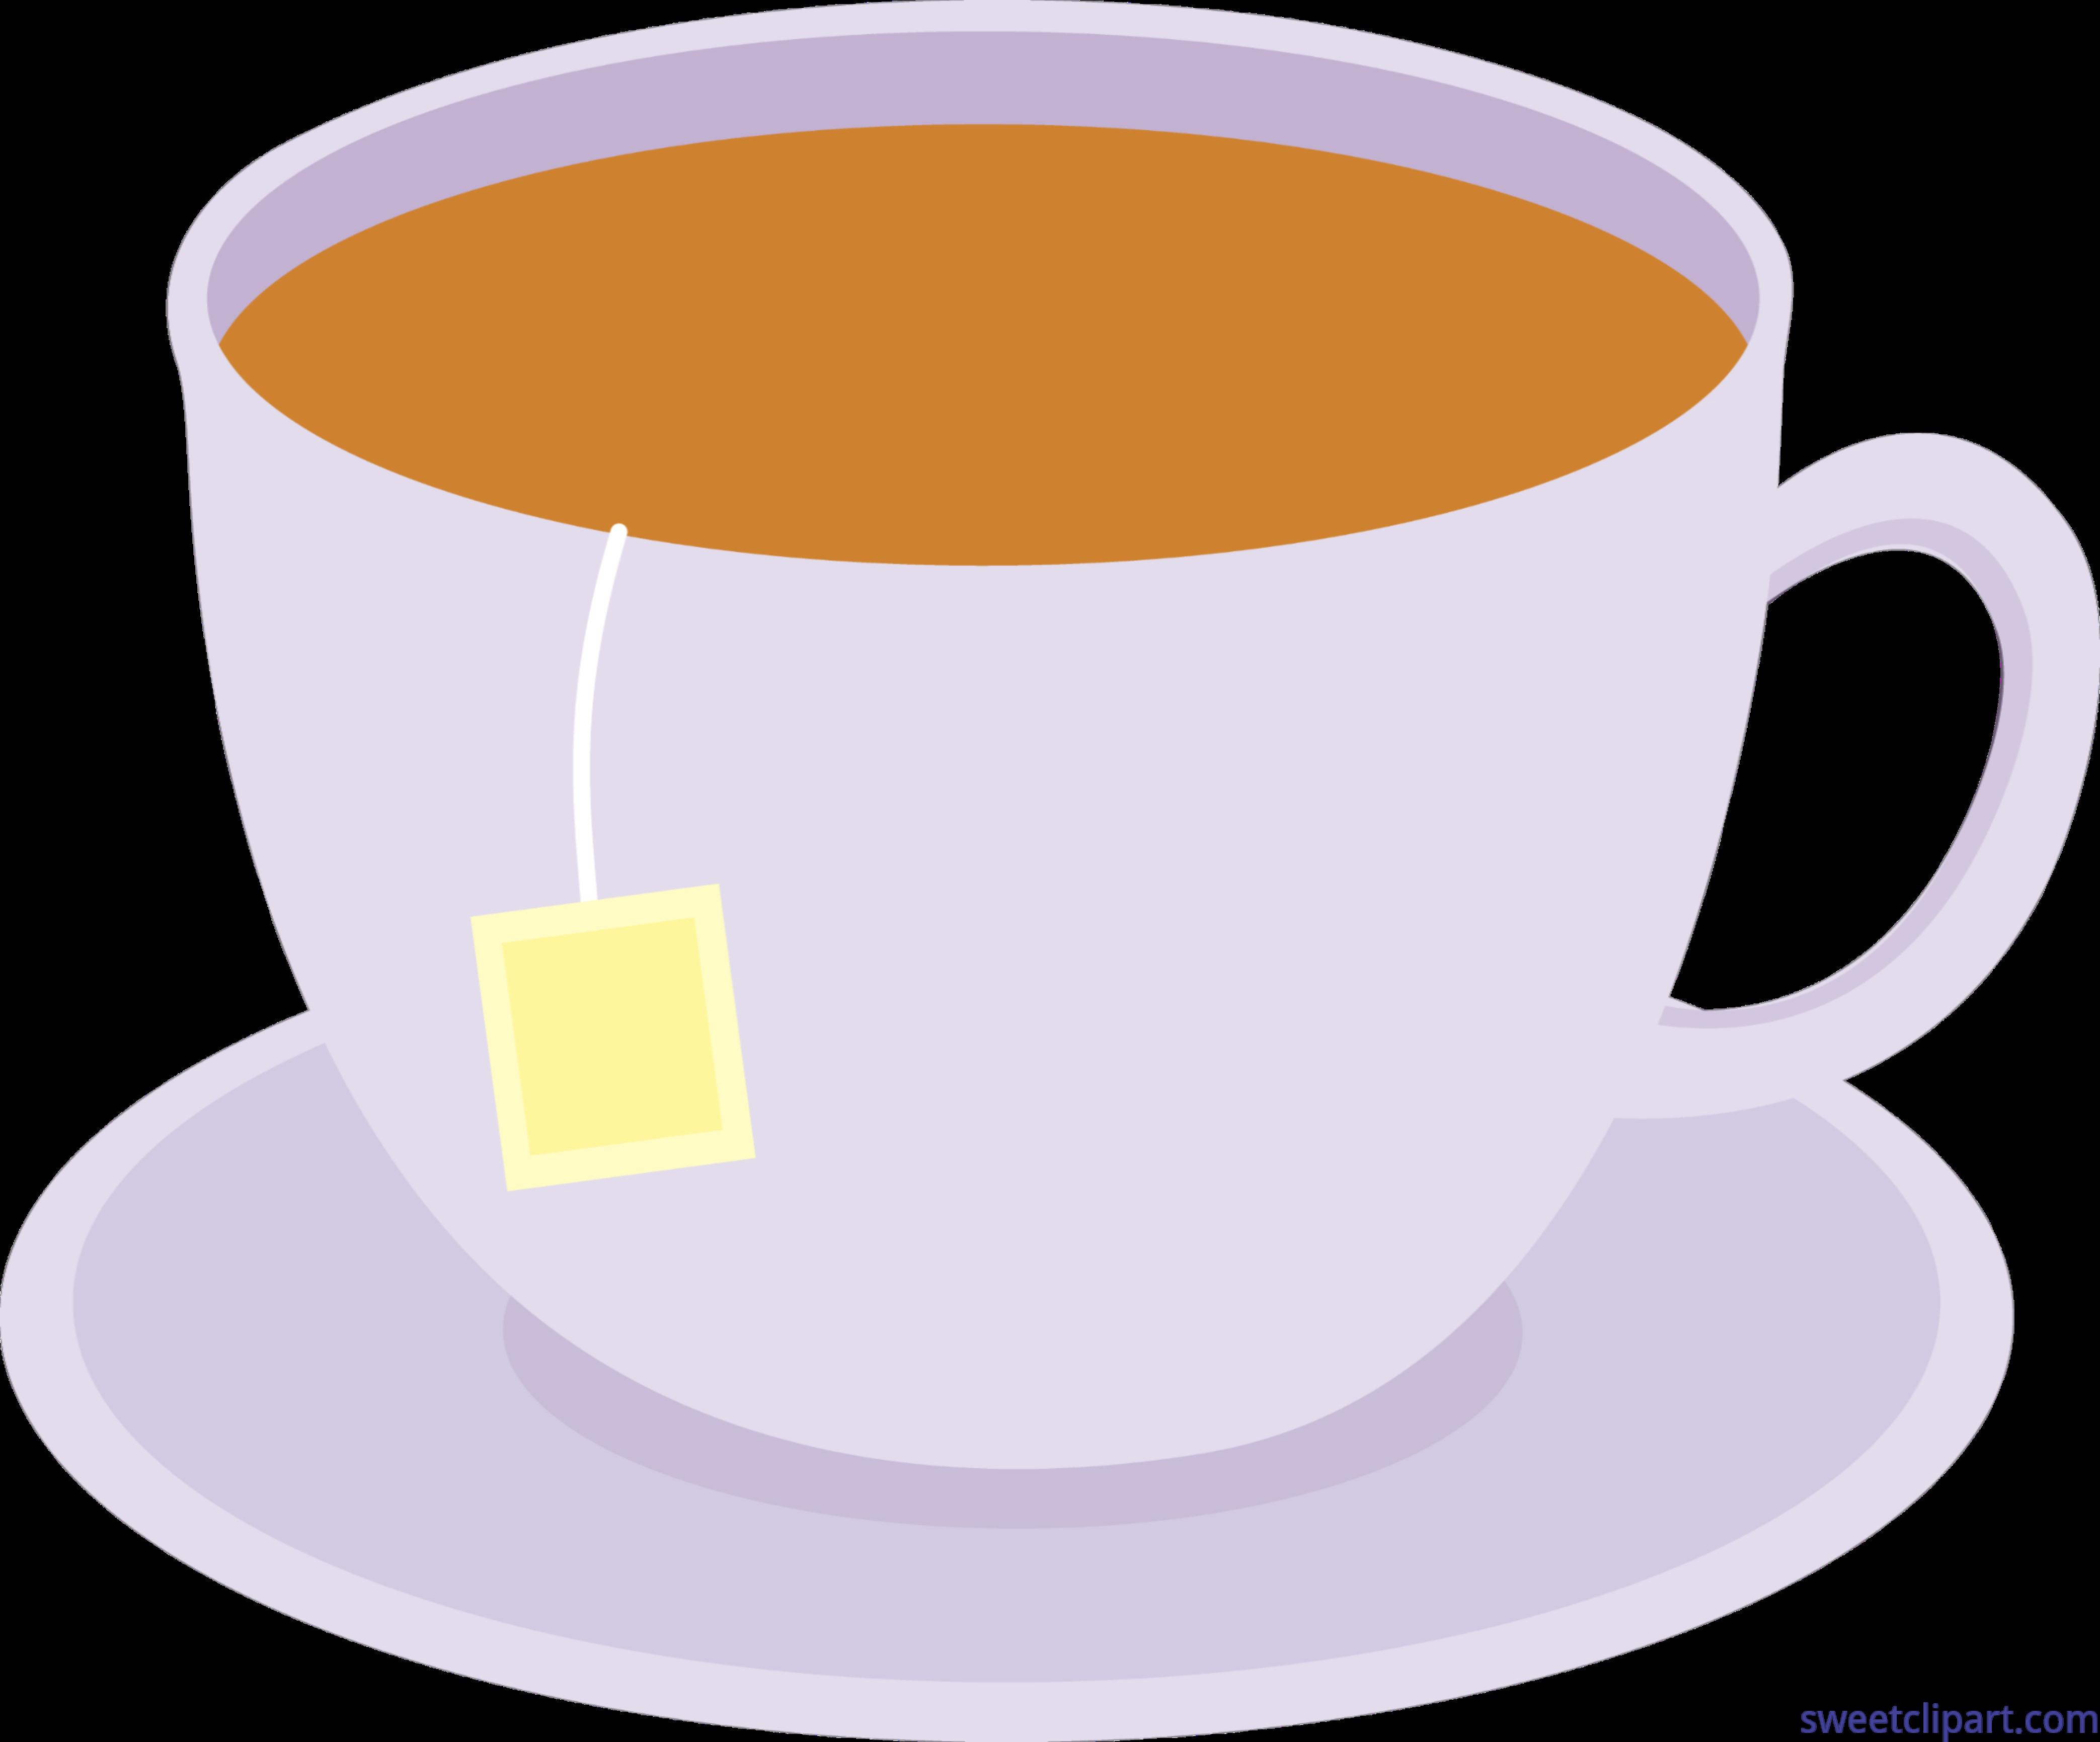 Cup Of Tea On Dish 1 Clip Art.